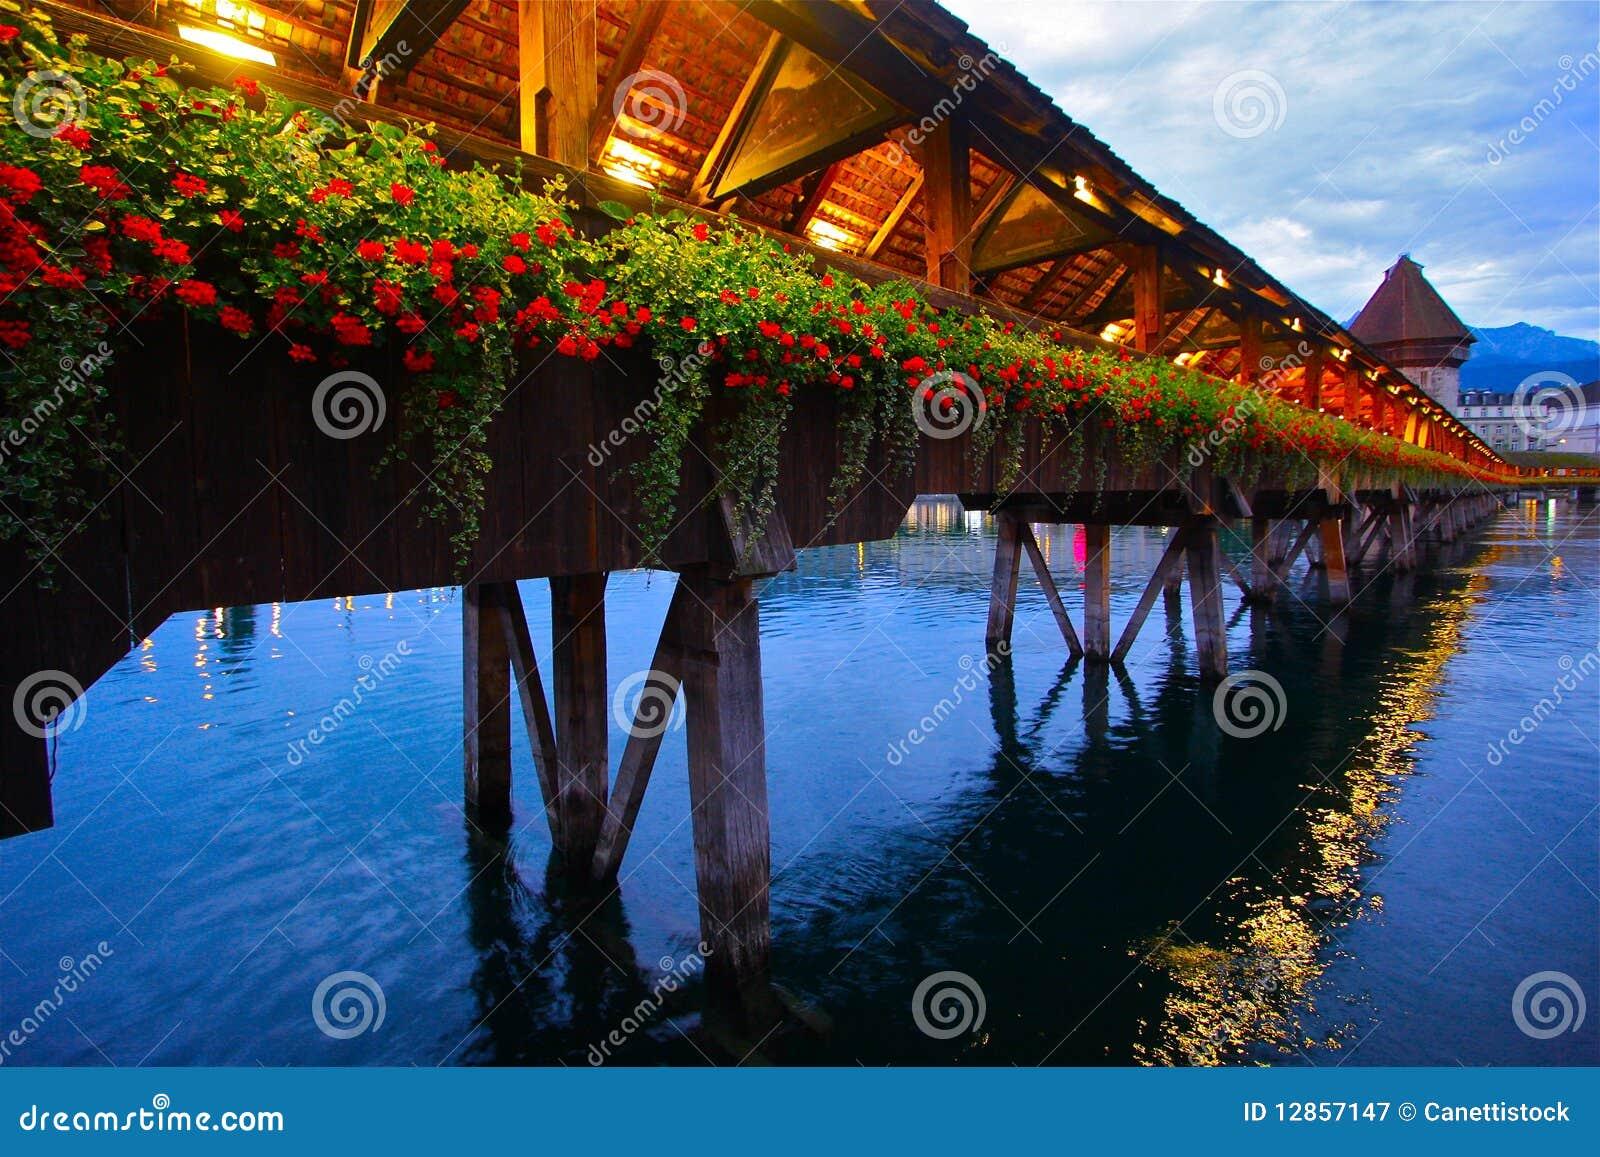 Incredible Chapel Bridge of Luzern